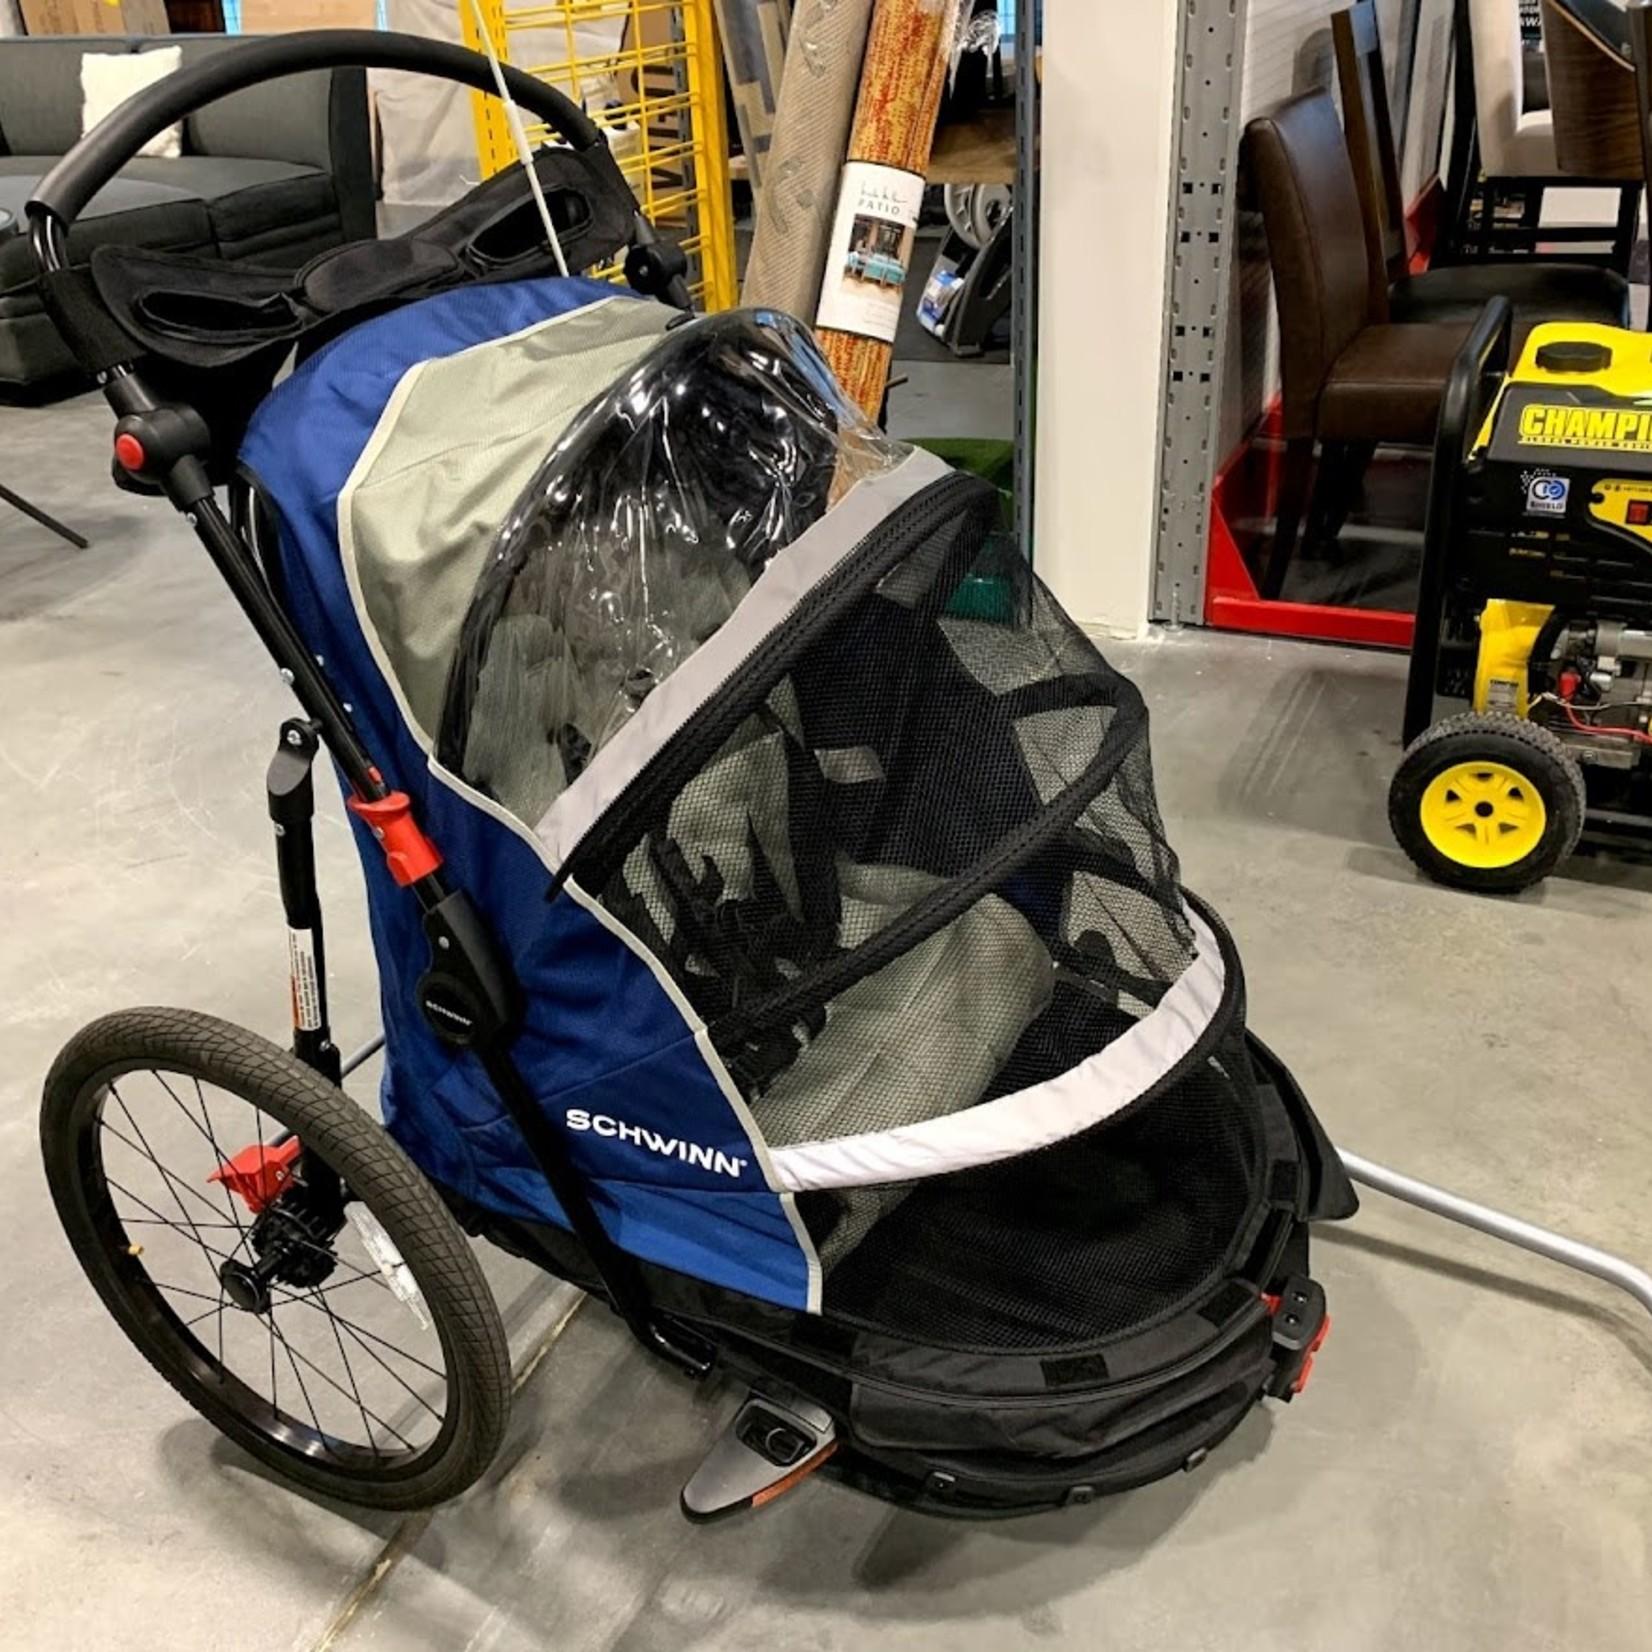 Schwinn Joyrider 2 Seat Bike Trailer *No box, like new, missing front wheel